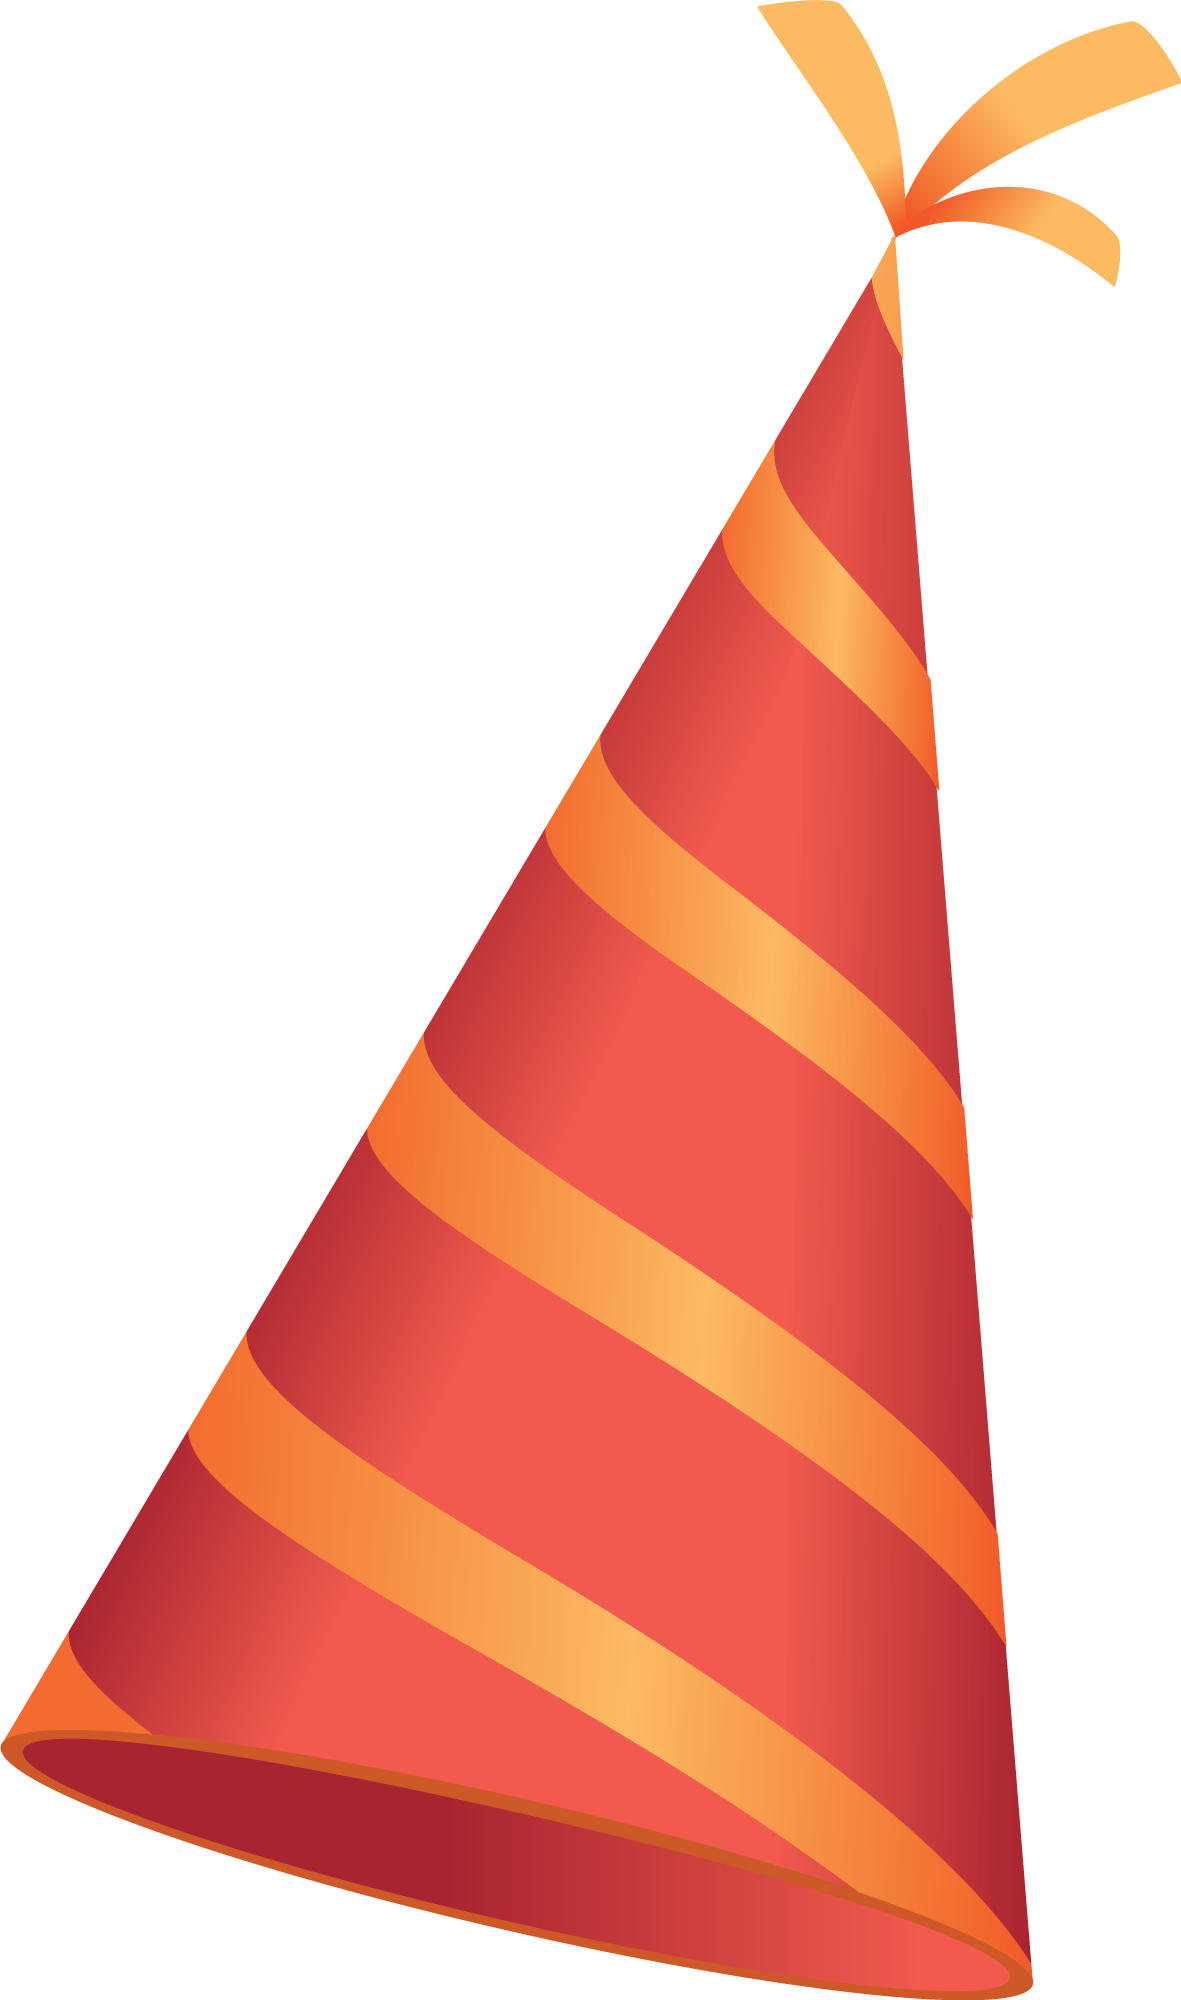 Birthday hat clipart 0